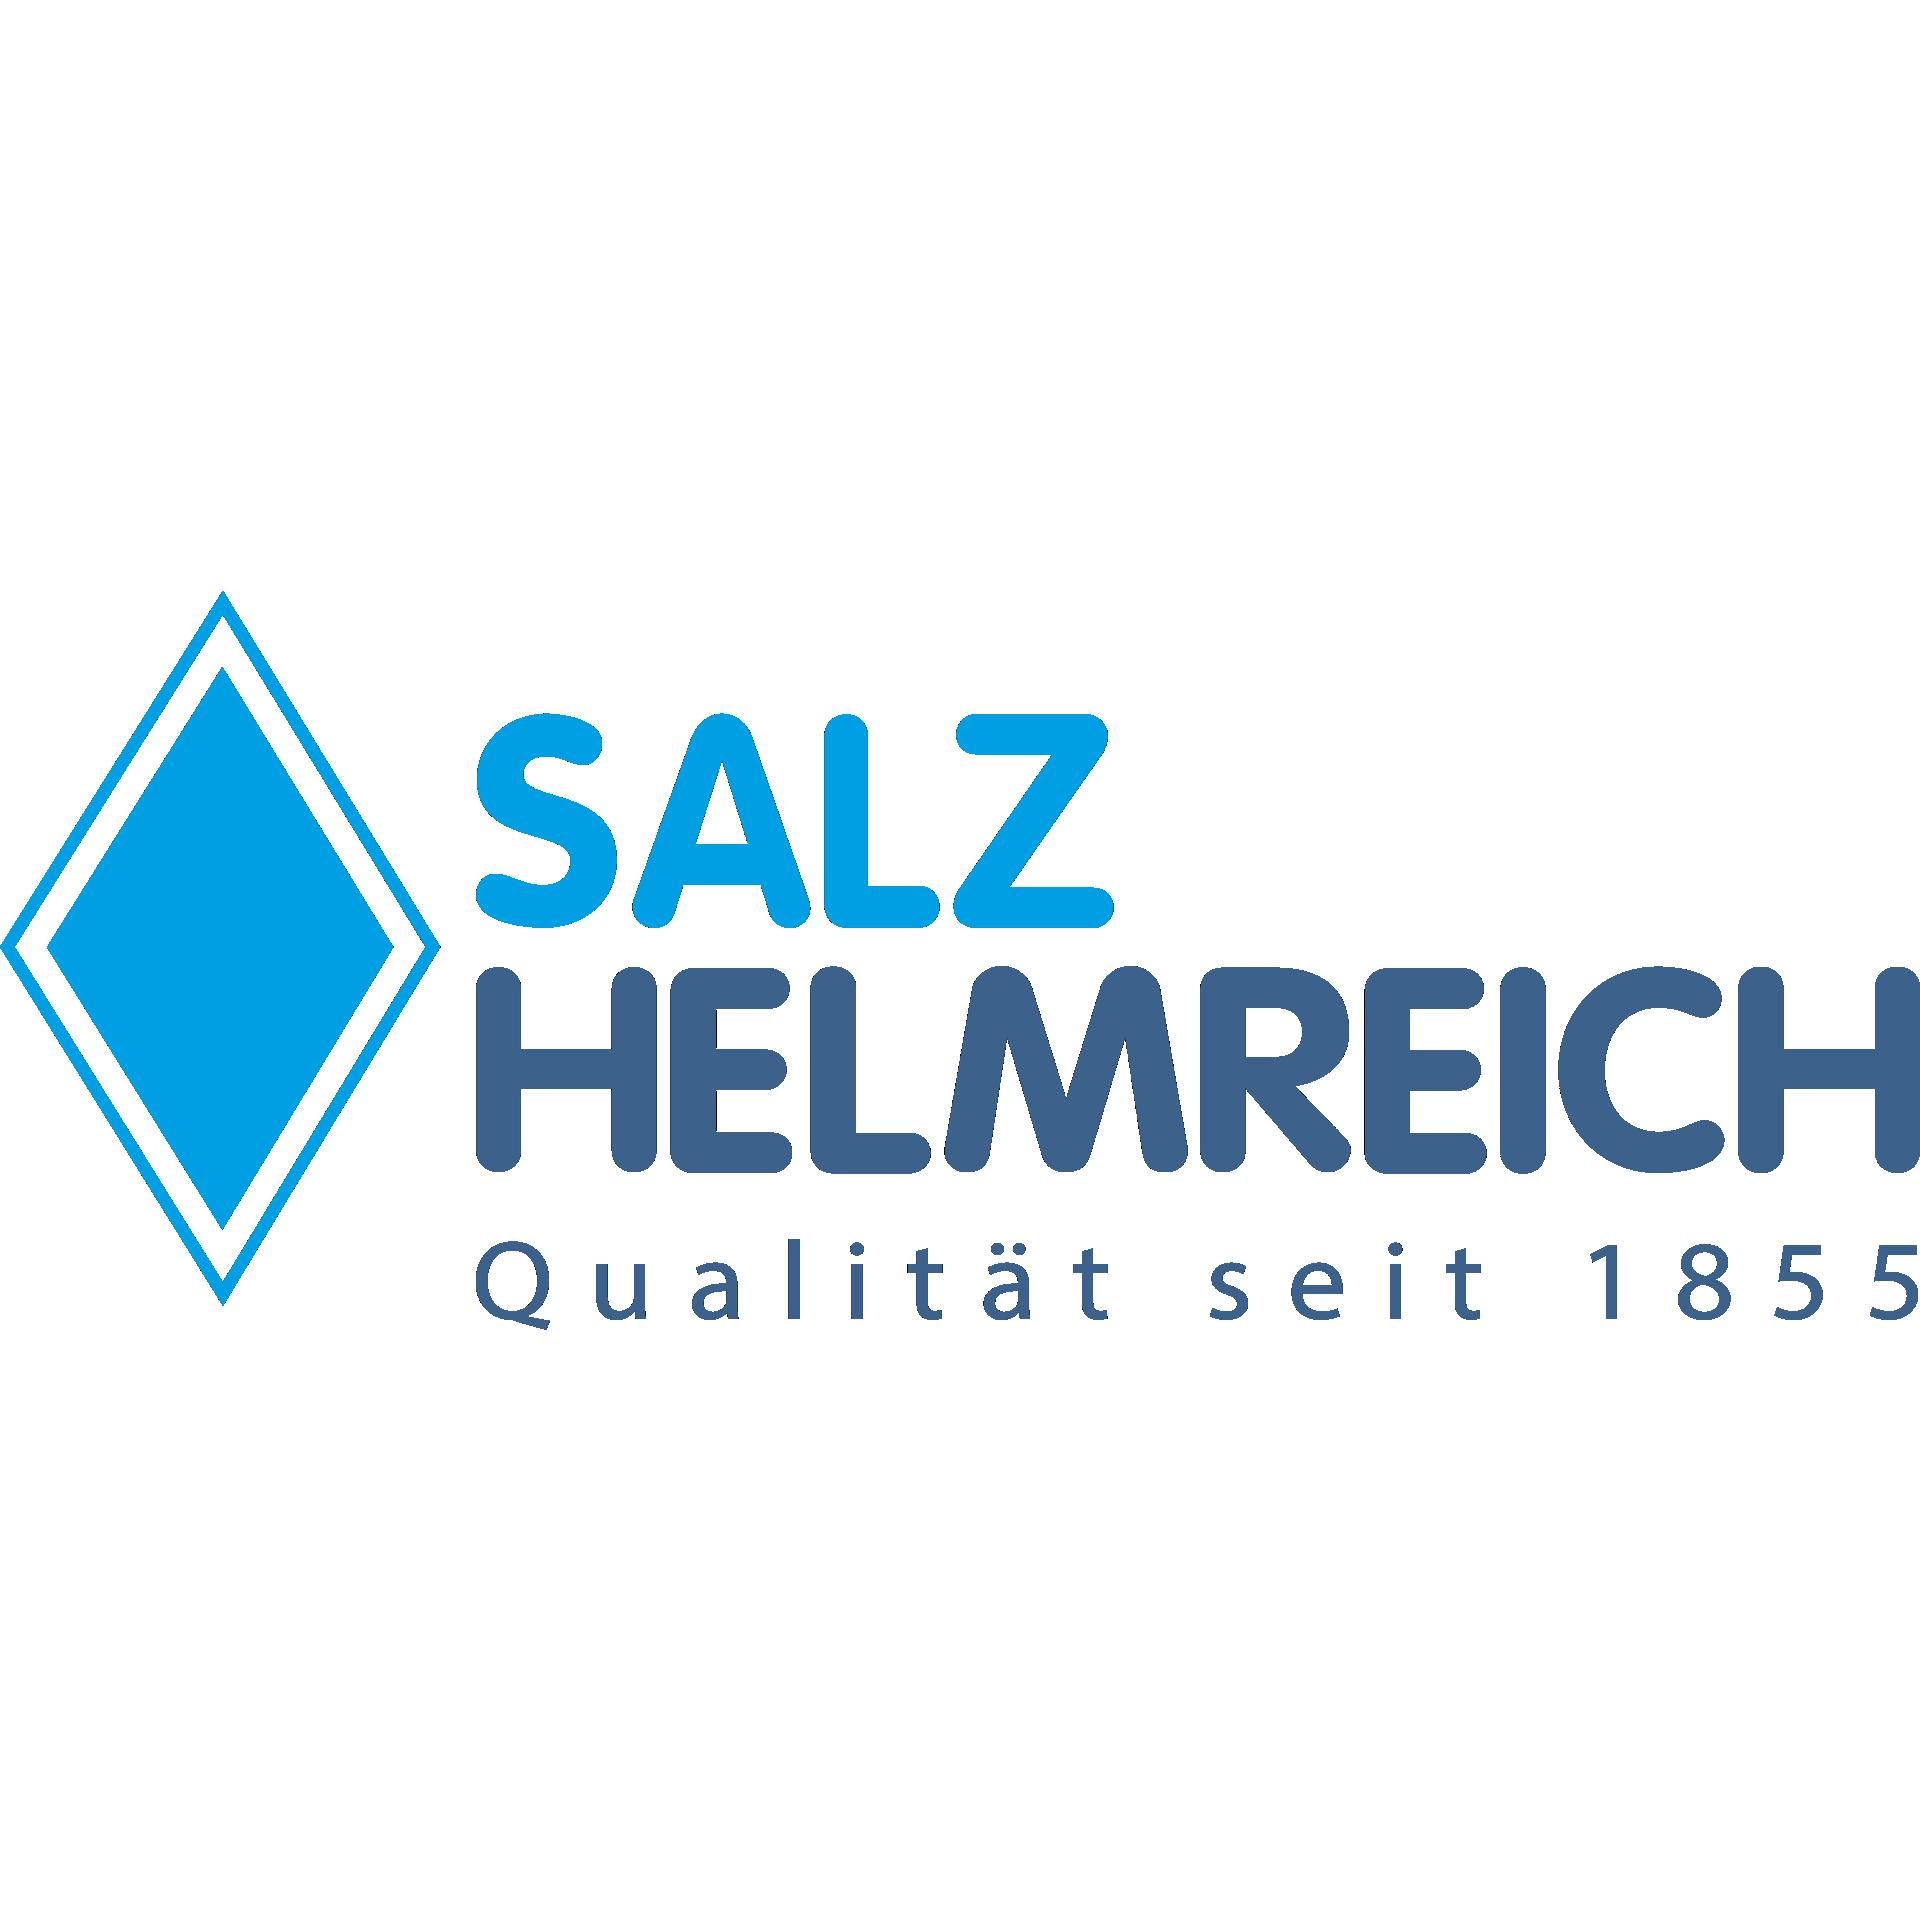 salz helmreich gmbh qualit t seit 1855. Black Bedroom Furniture Sets. Home Design Ideas